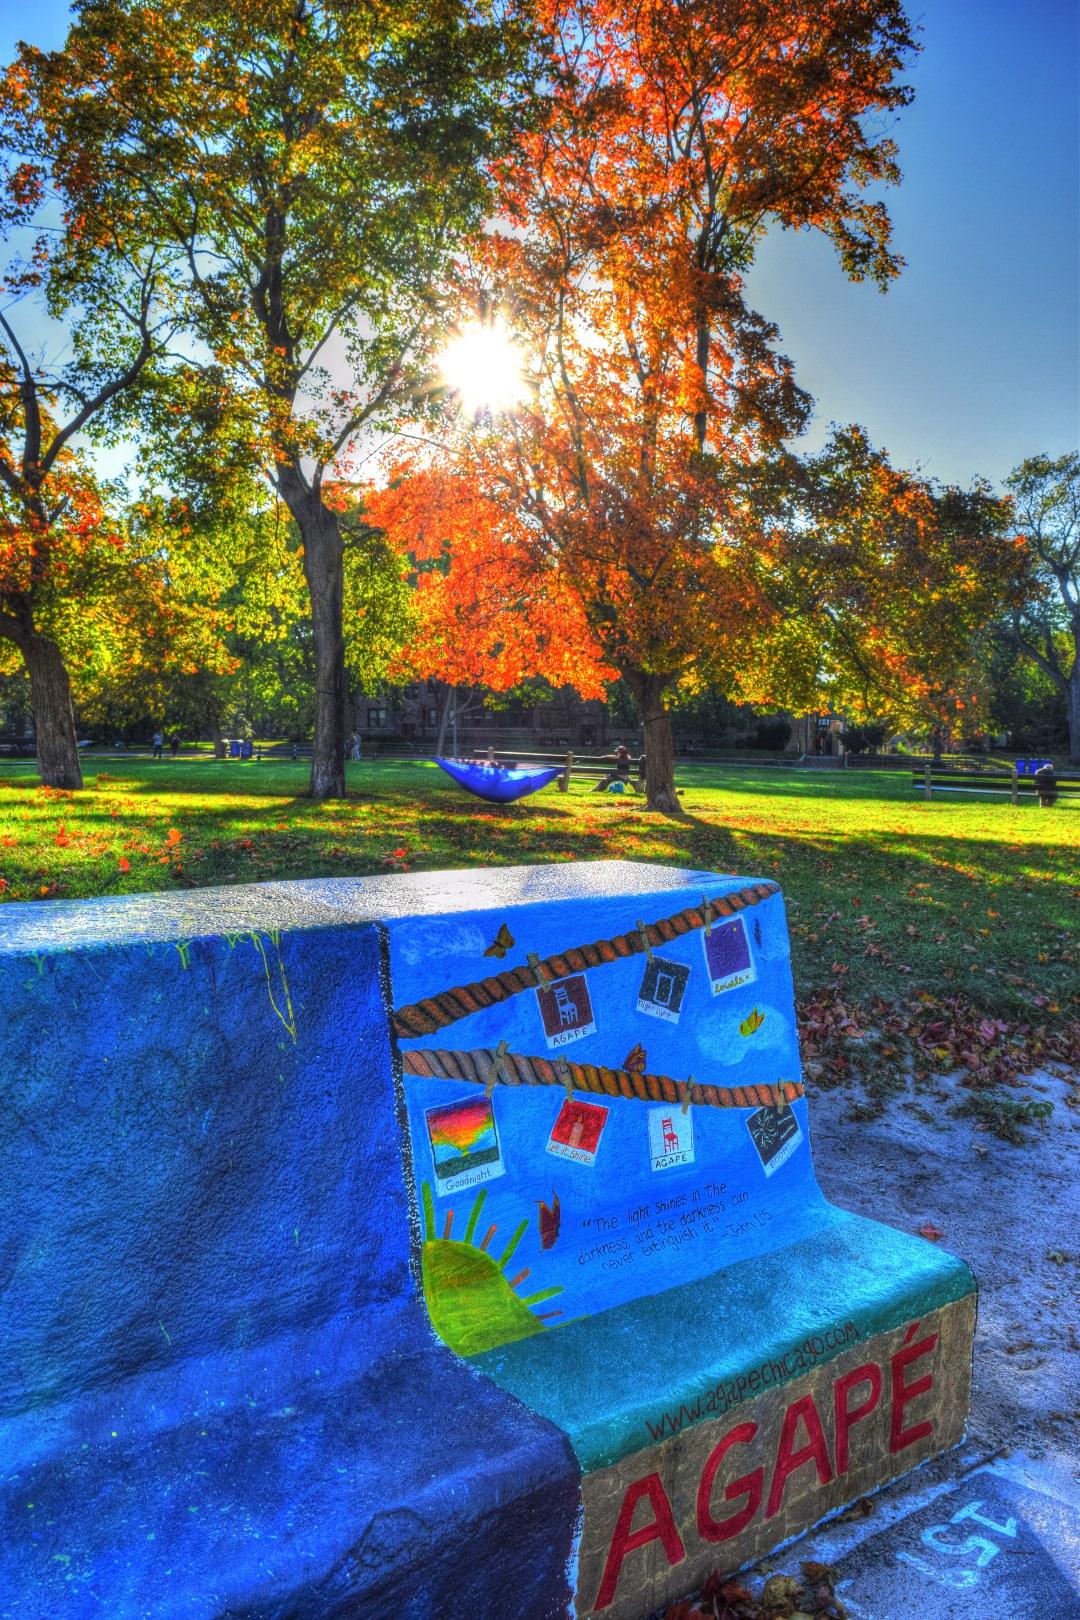 graffiti-sun-street-art-tree1.jpg